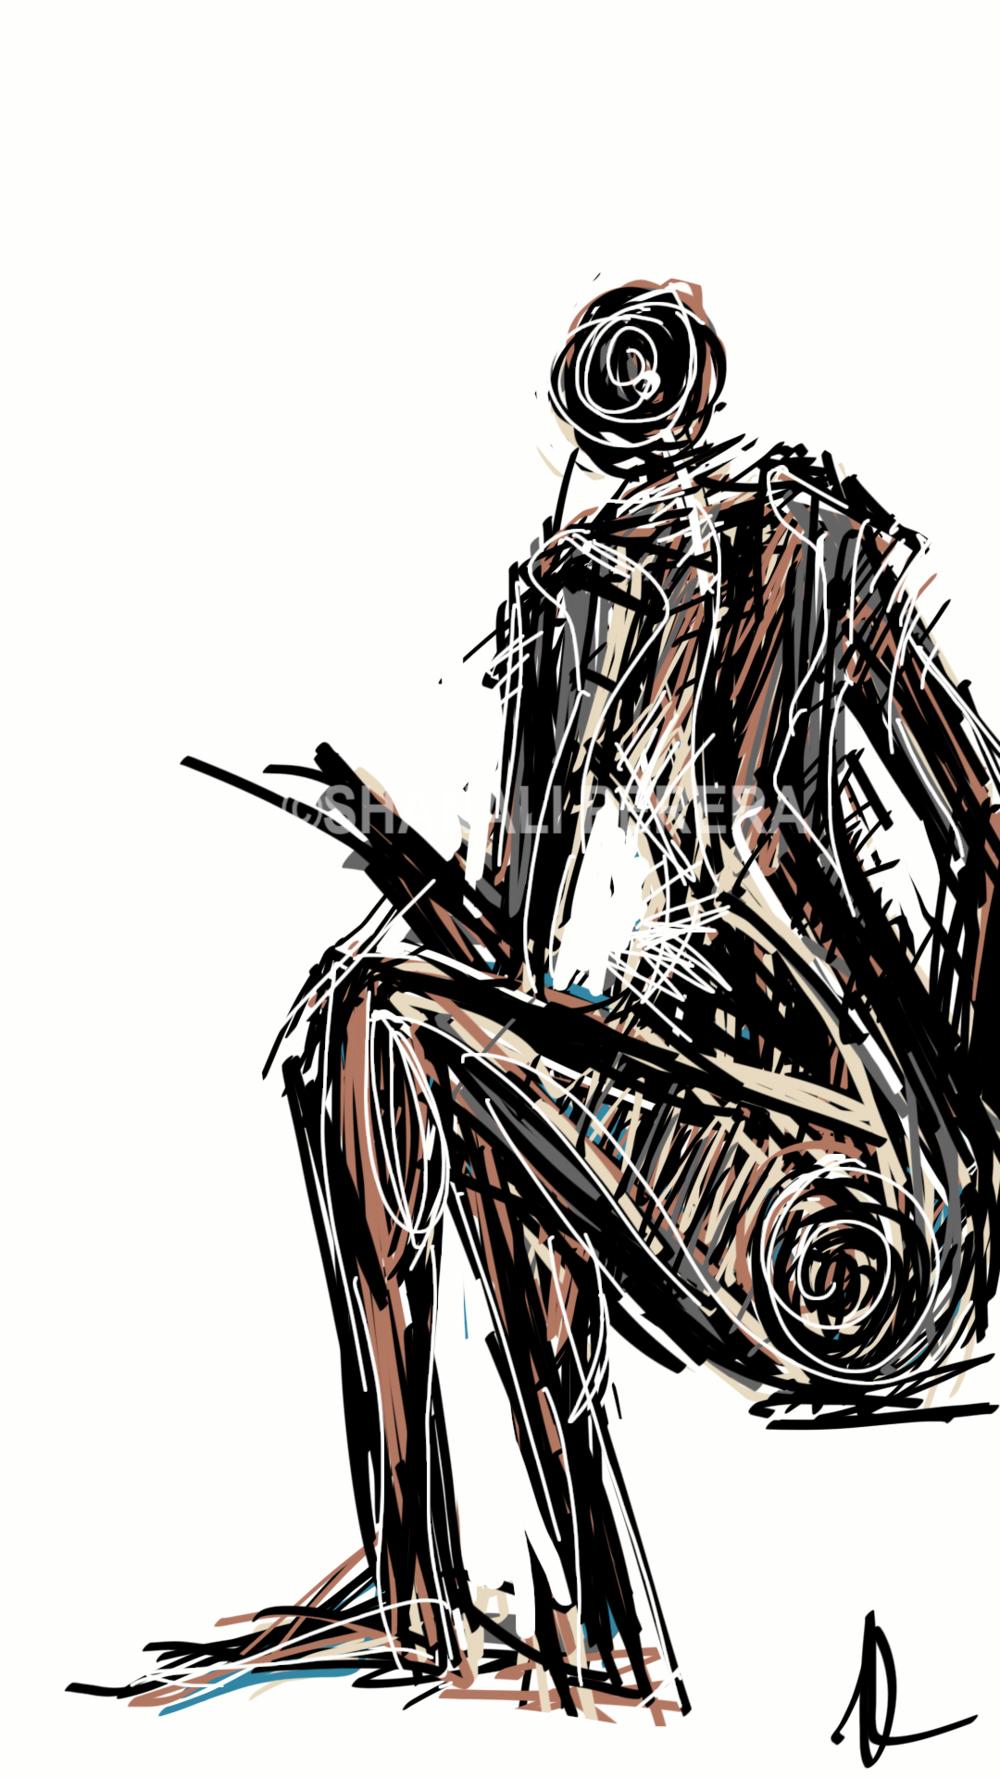 sketch-1509468700017.png